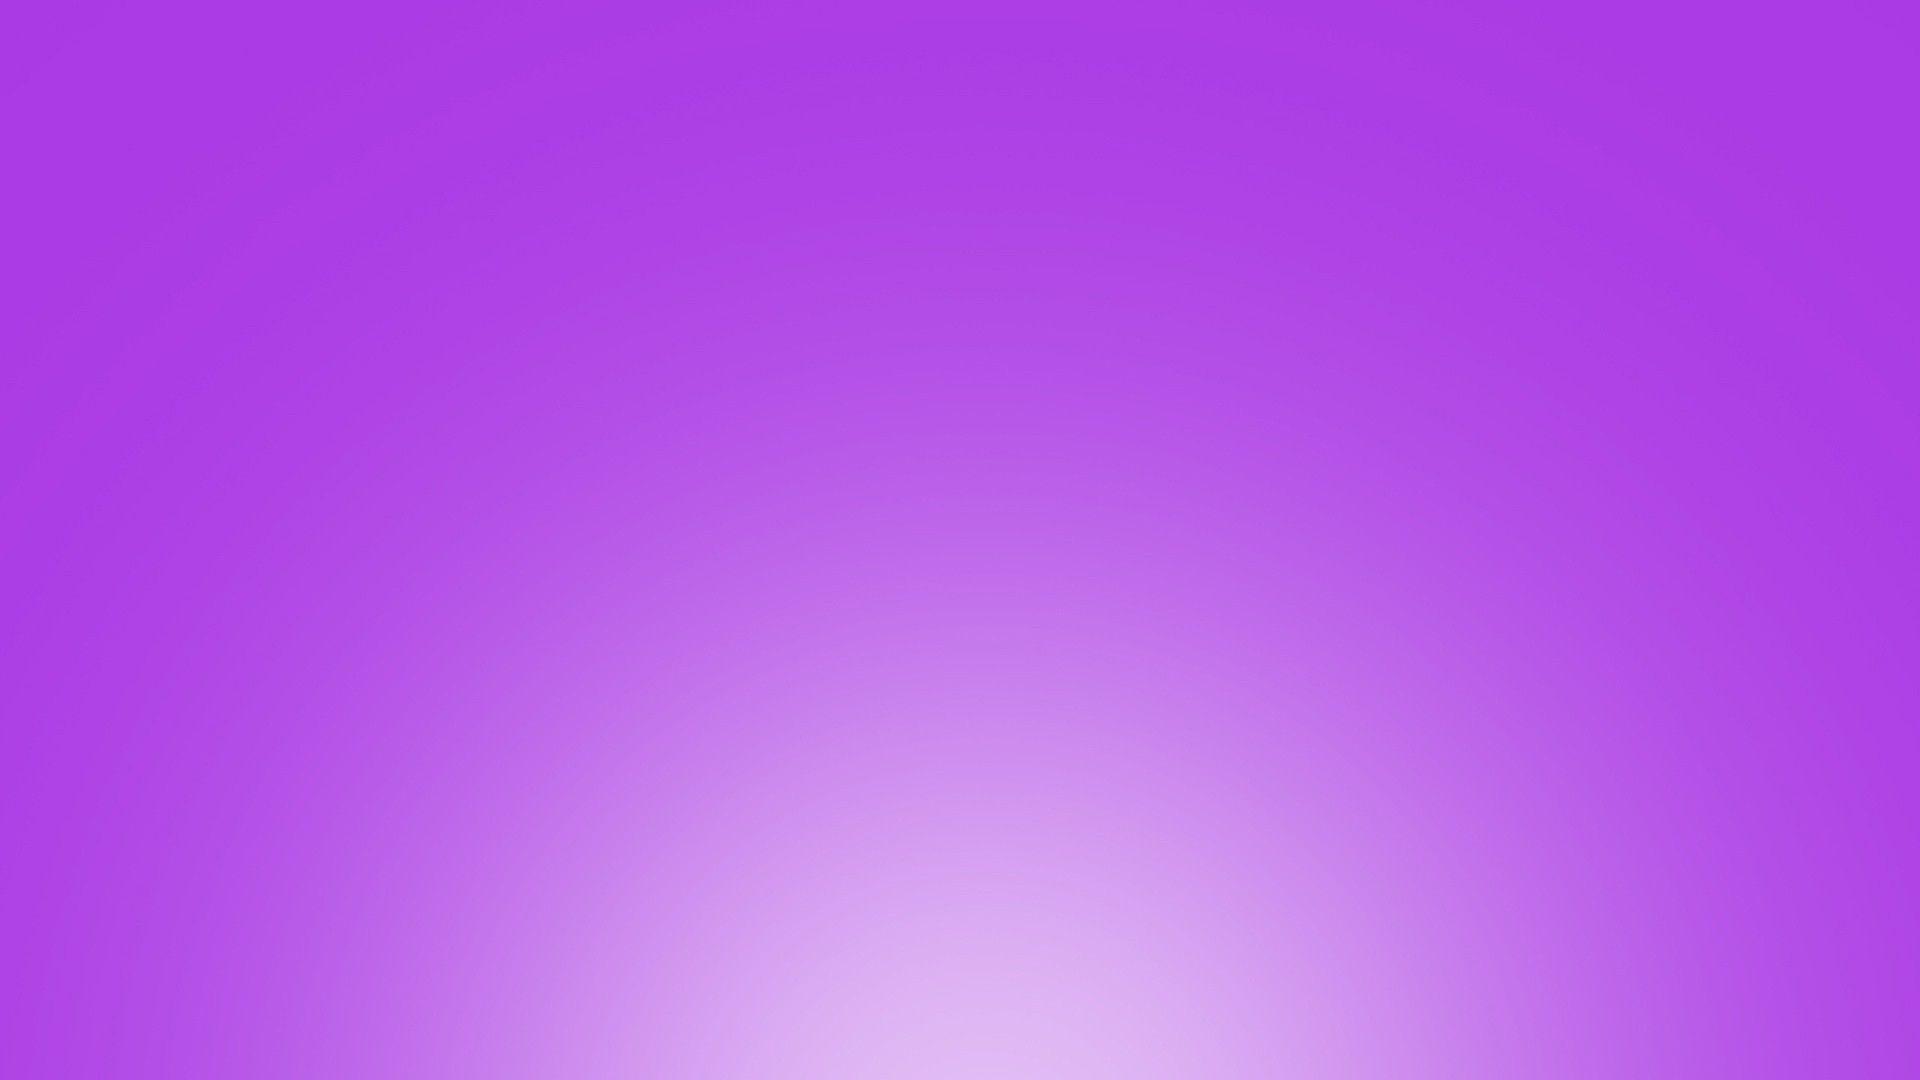 Le fond violet for Sfondi hd viola